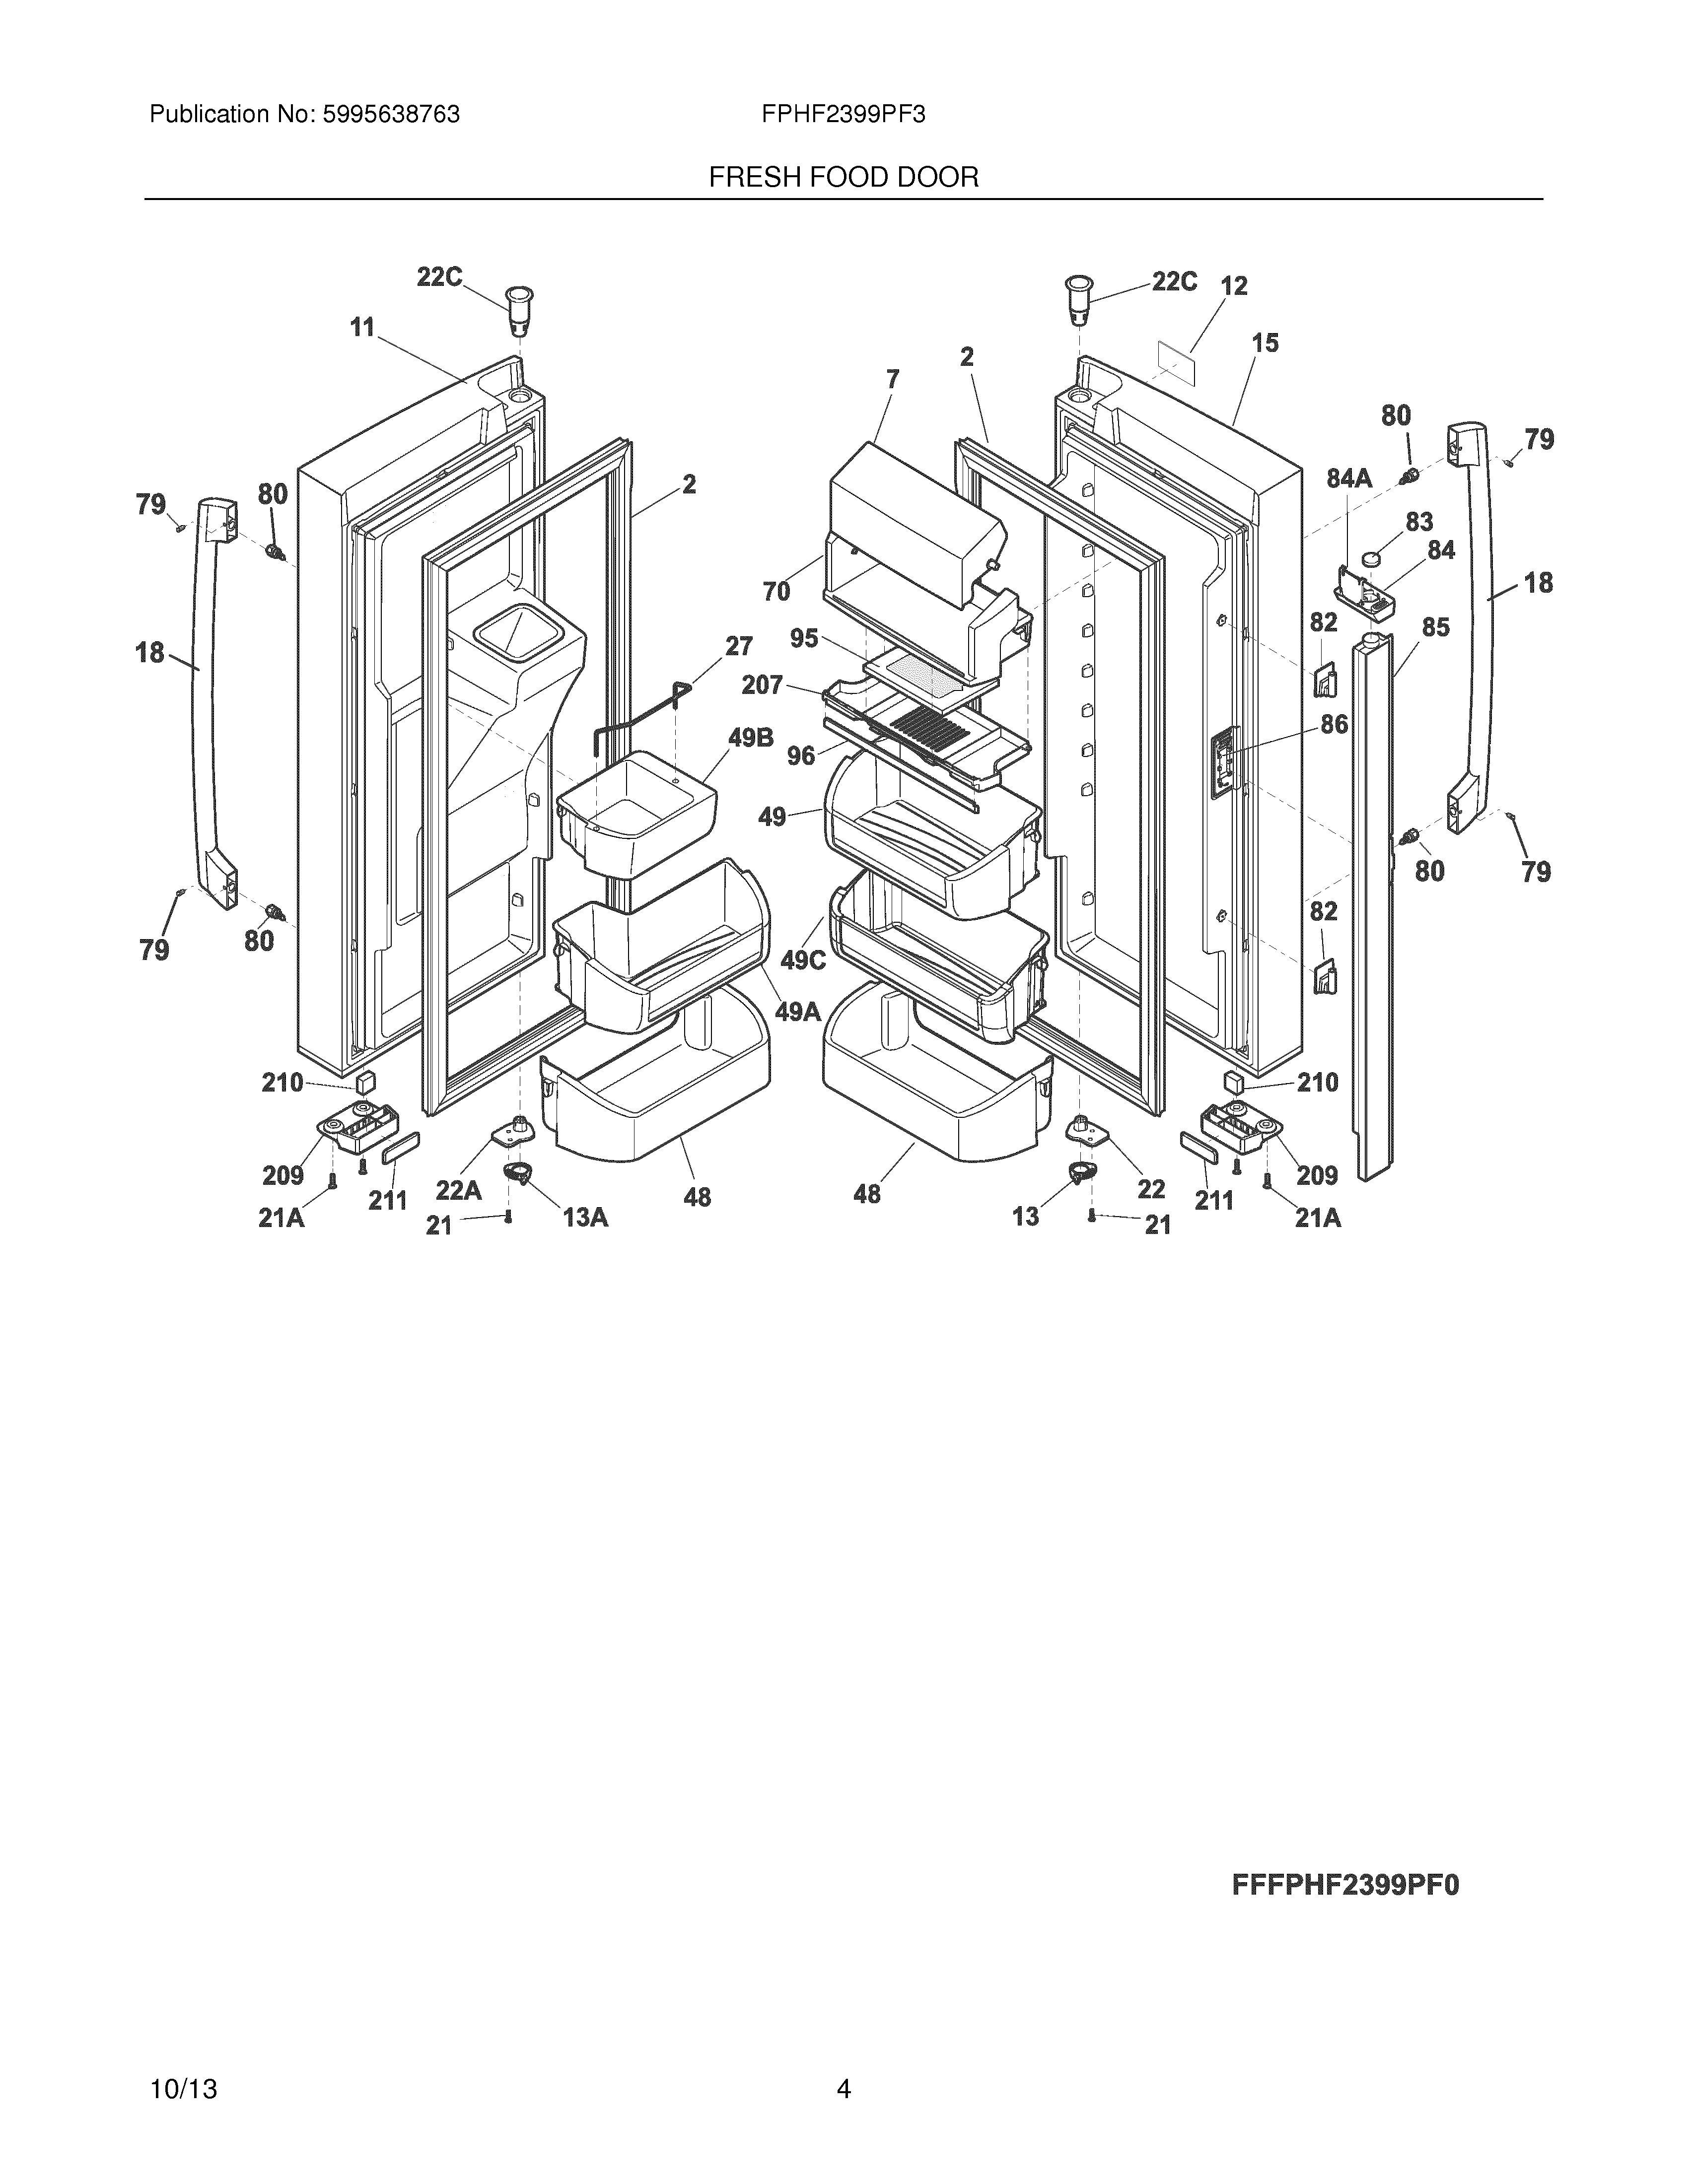 whirlpool gold refrigerator parts diagram paxton door access wiring ice maker dispenser get free